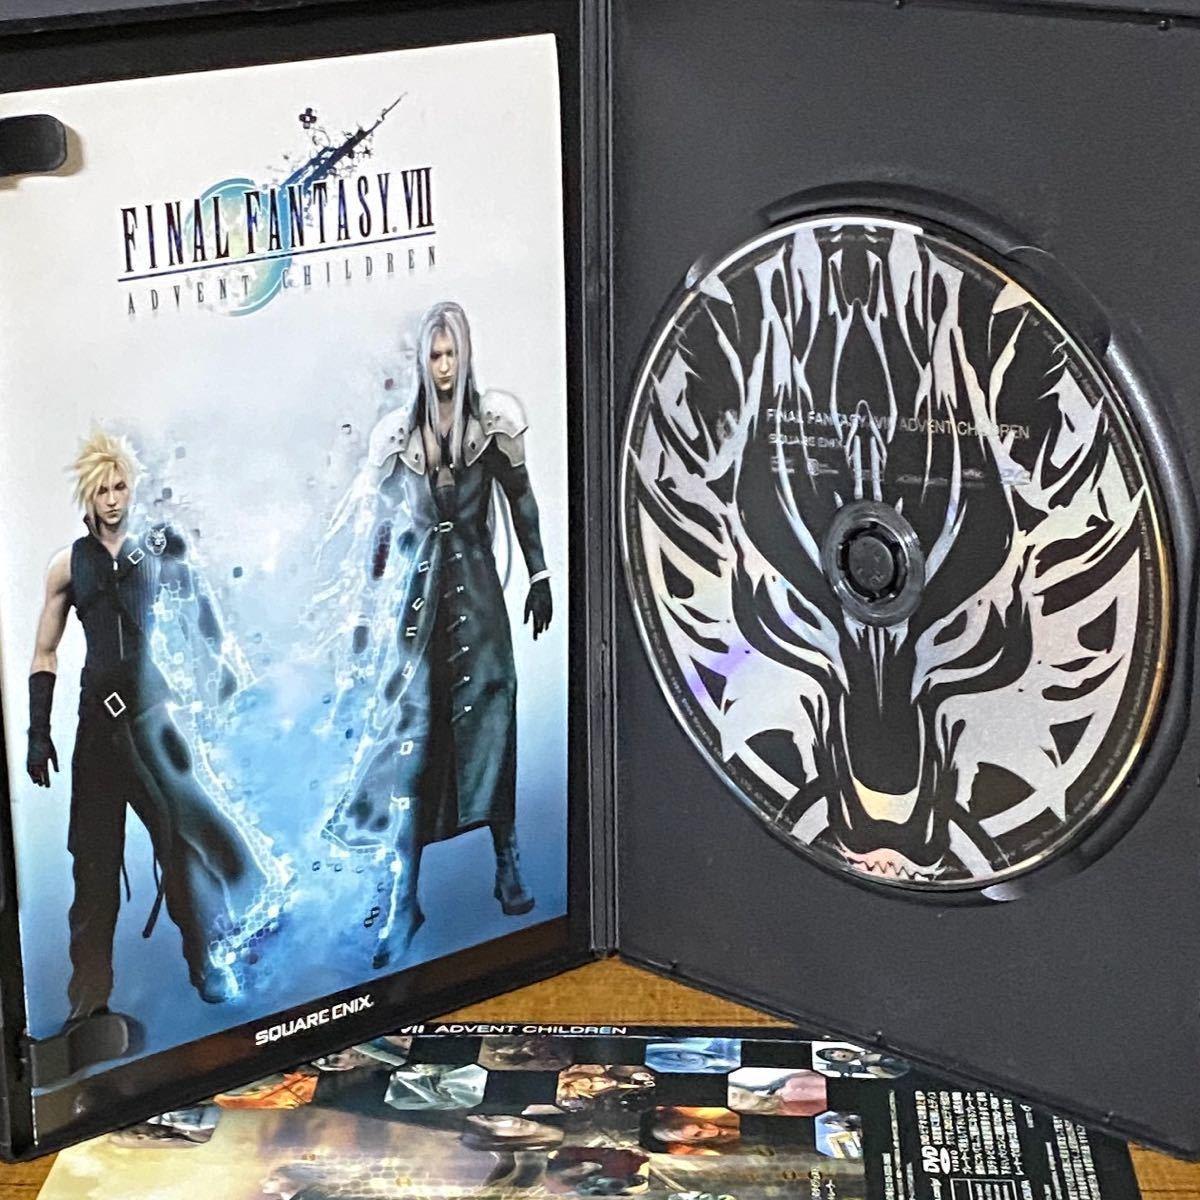 【DVD】 ファイナルファンタジーVII アドベントチルドレン